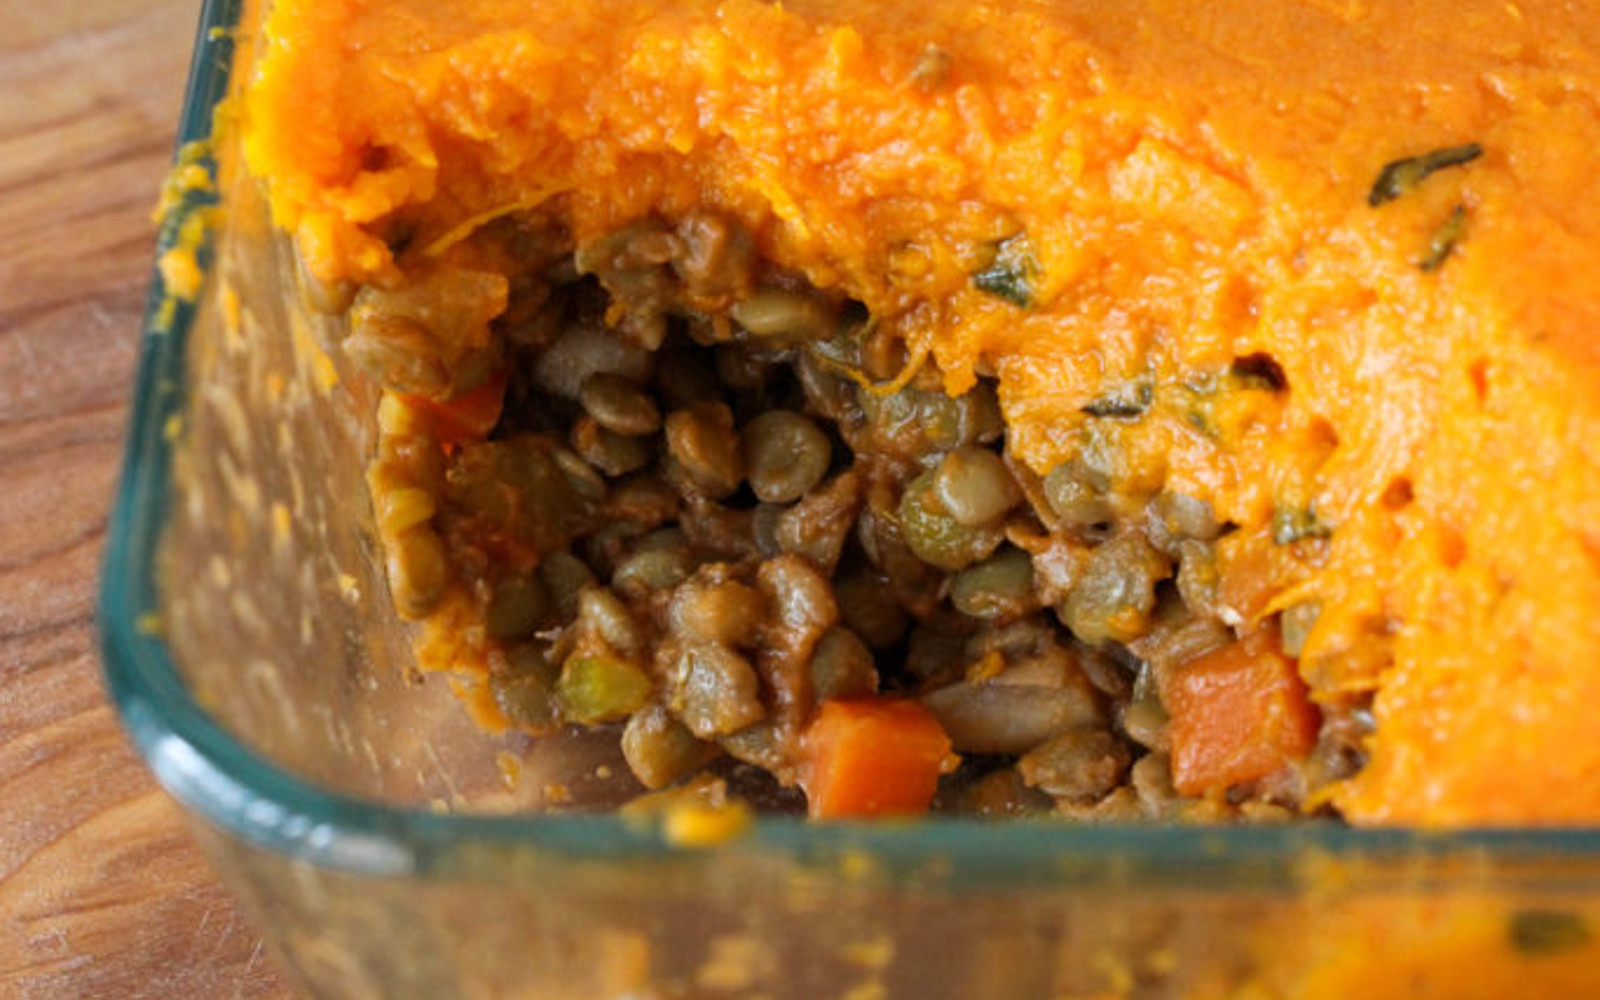 Vegan Gluten-Free Sweet Potato and Sage Lentil Shepherds Pie